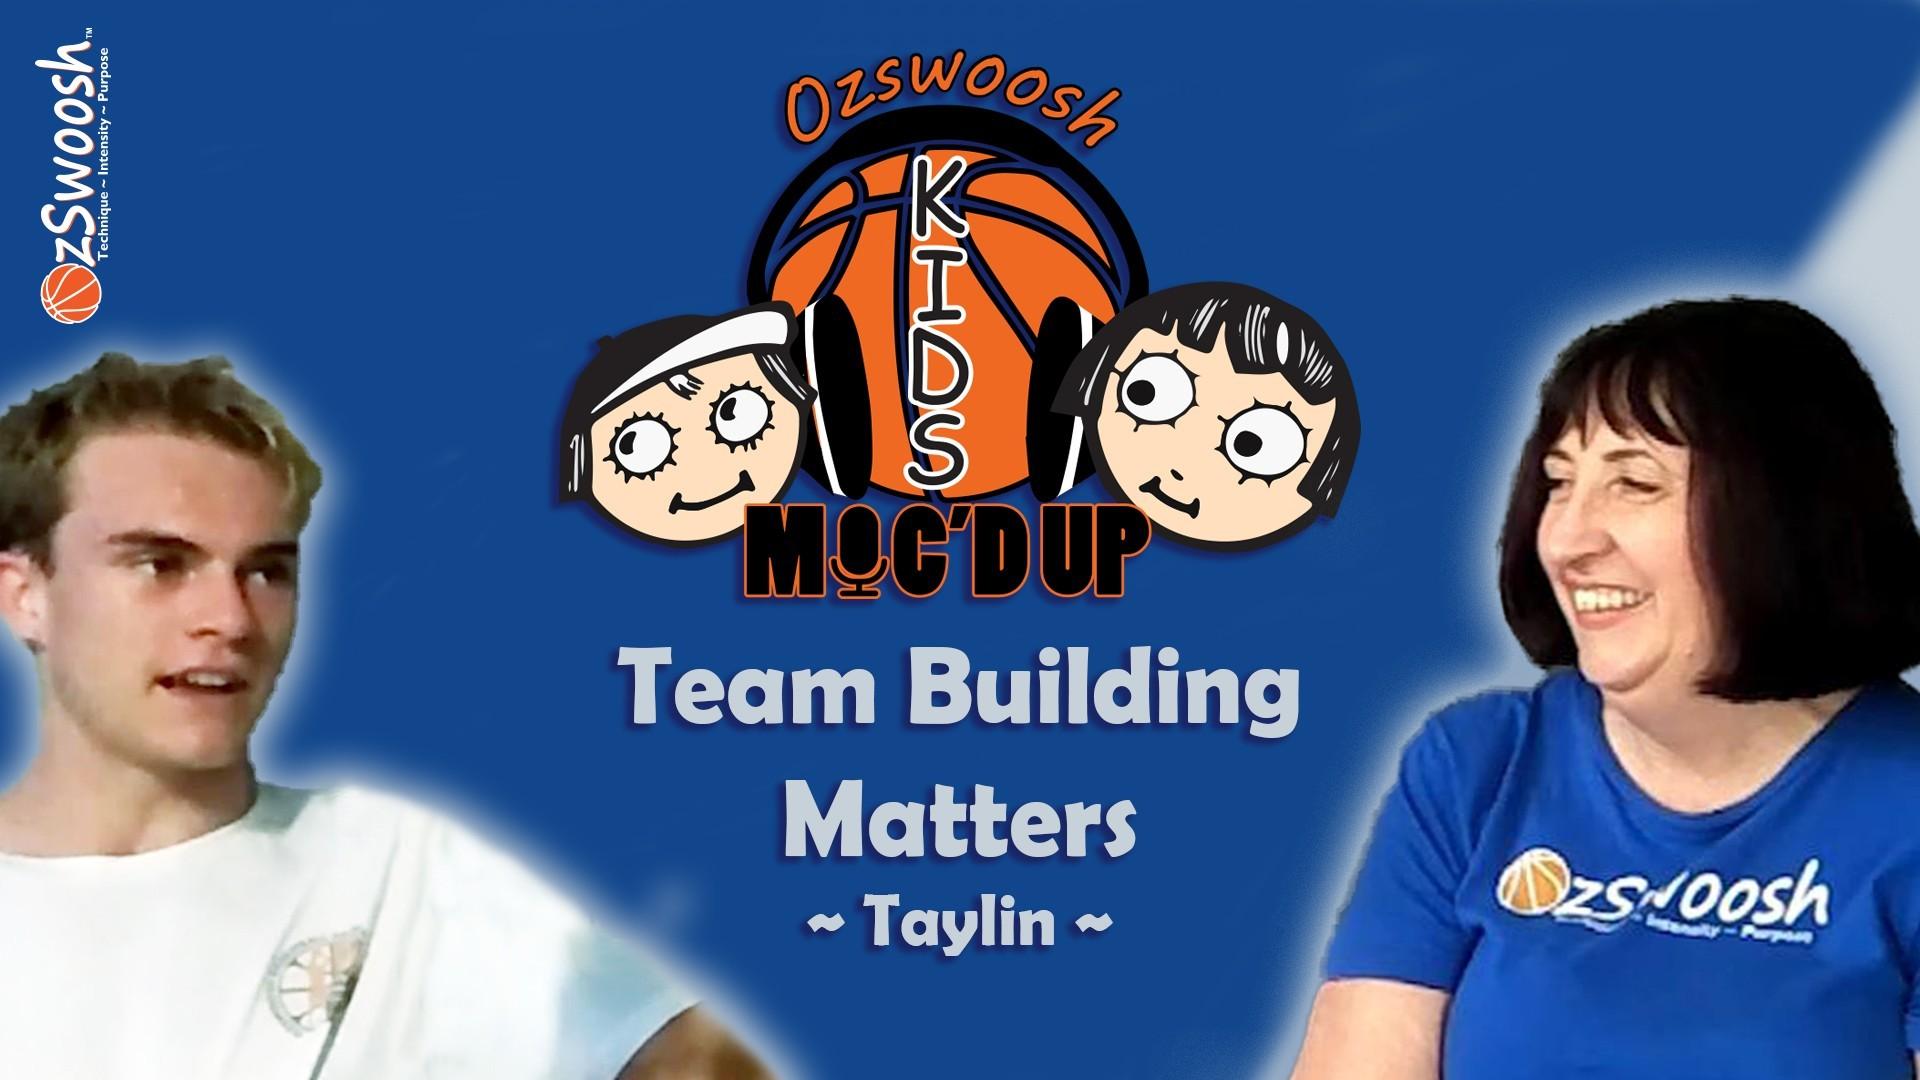 Team Building In Basketball - OzSwoosh Academy Athlete Taylin